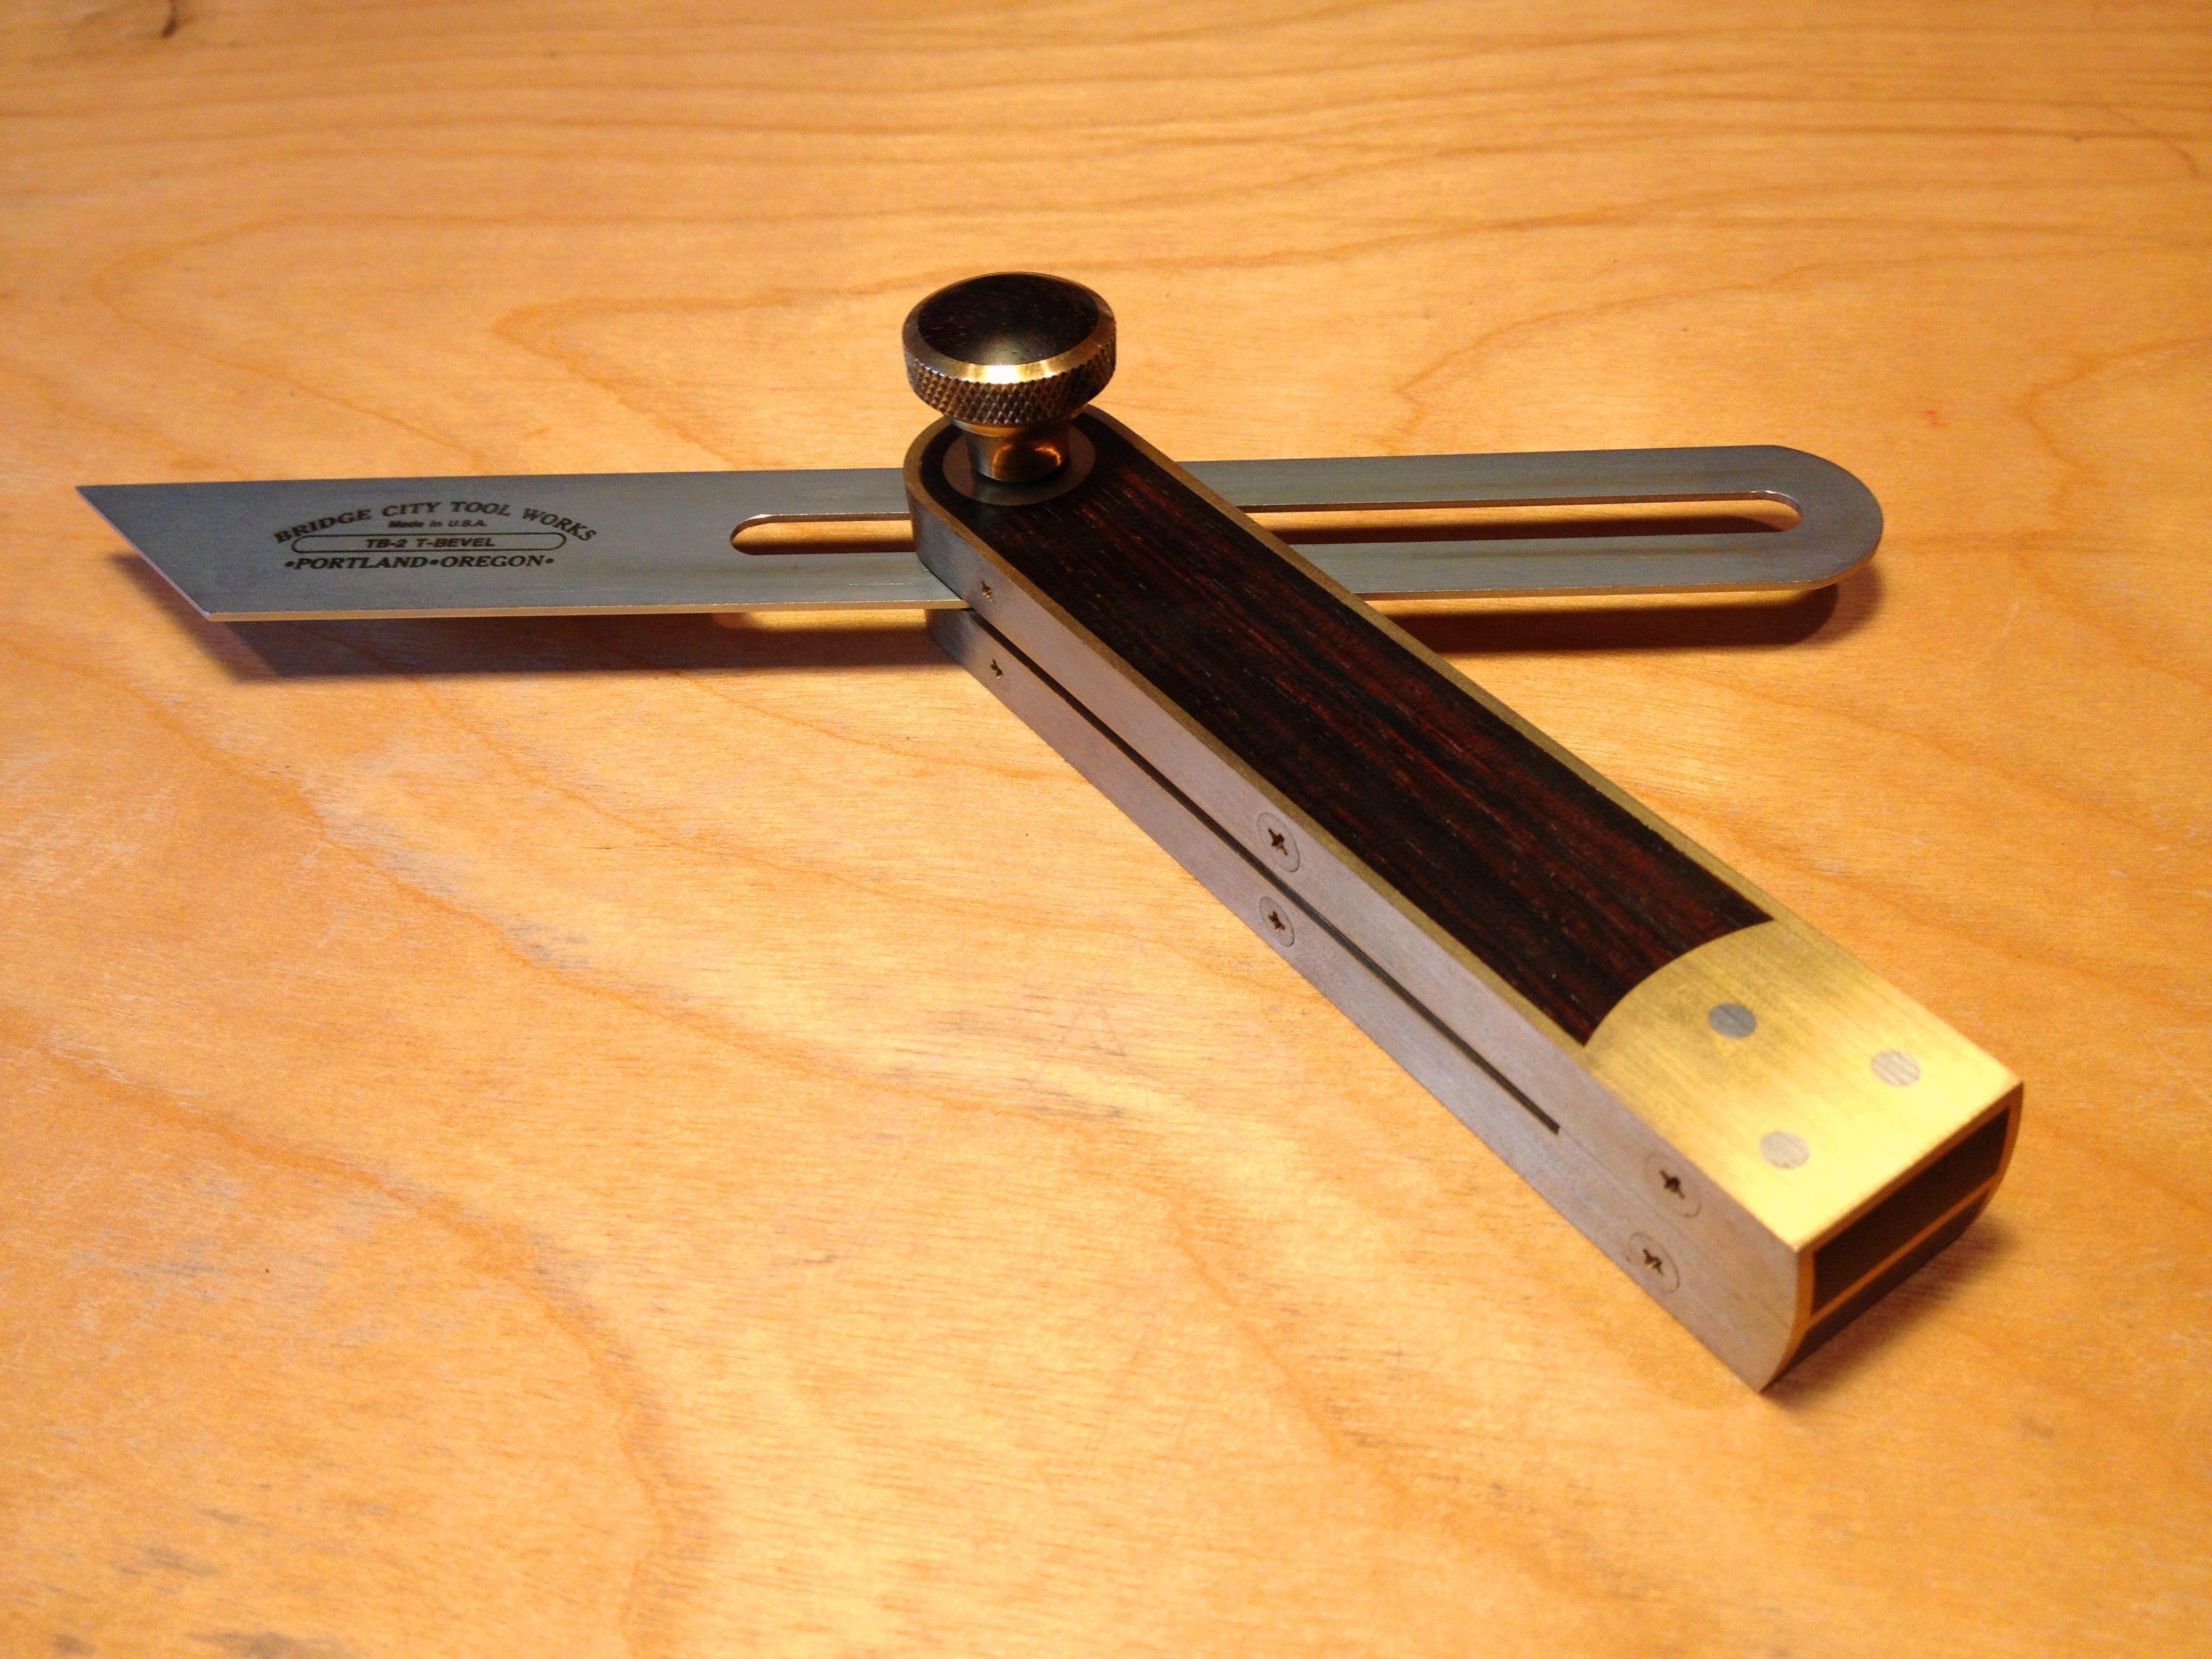 Bridge City Tool Works Tb 2 Sliding Bevel Vintage